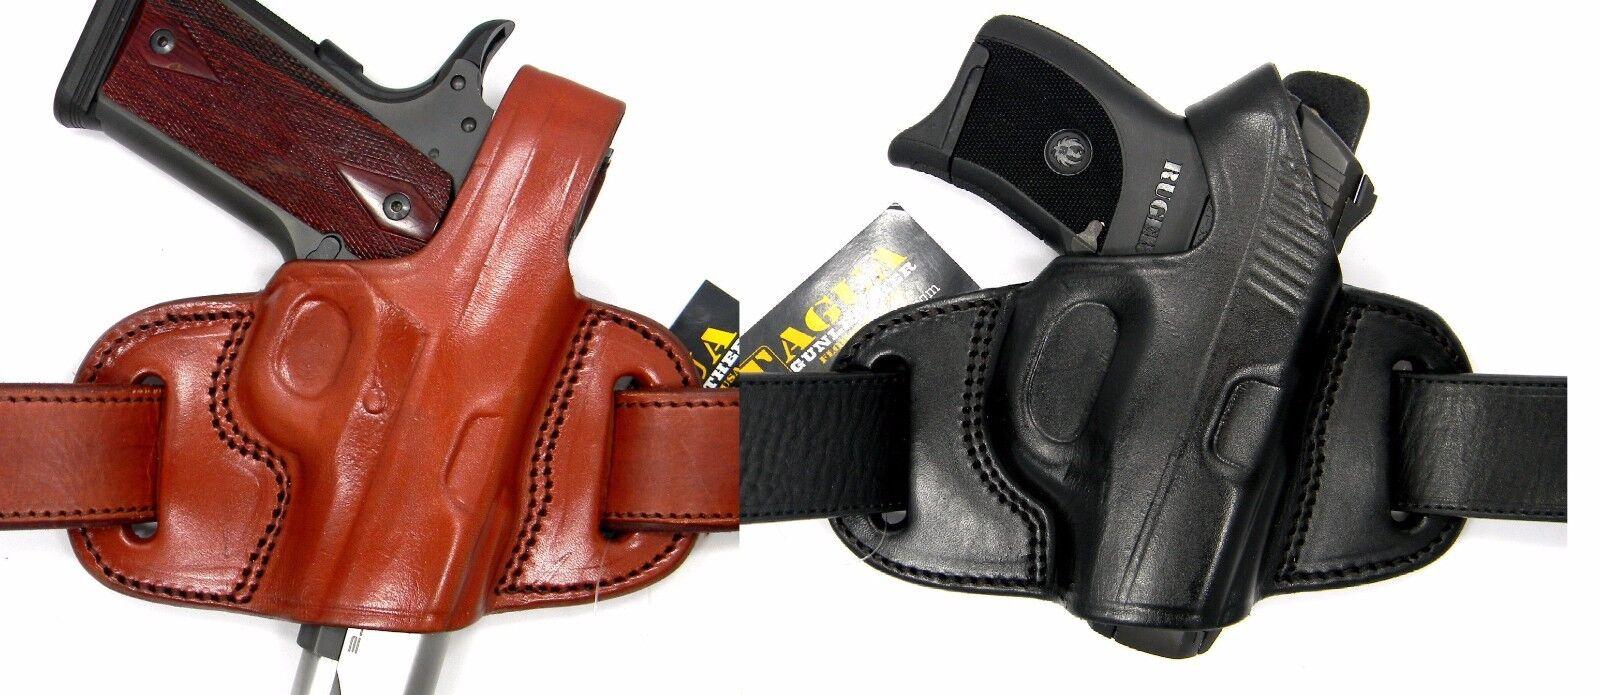 TAGUA LEATHER MINI THUMB BREAK OWB BELT SLIDE HOLSTER - Choose Your Gun